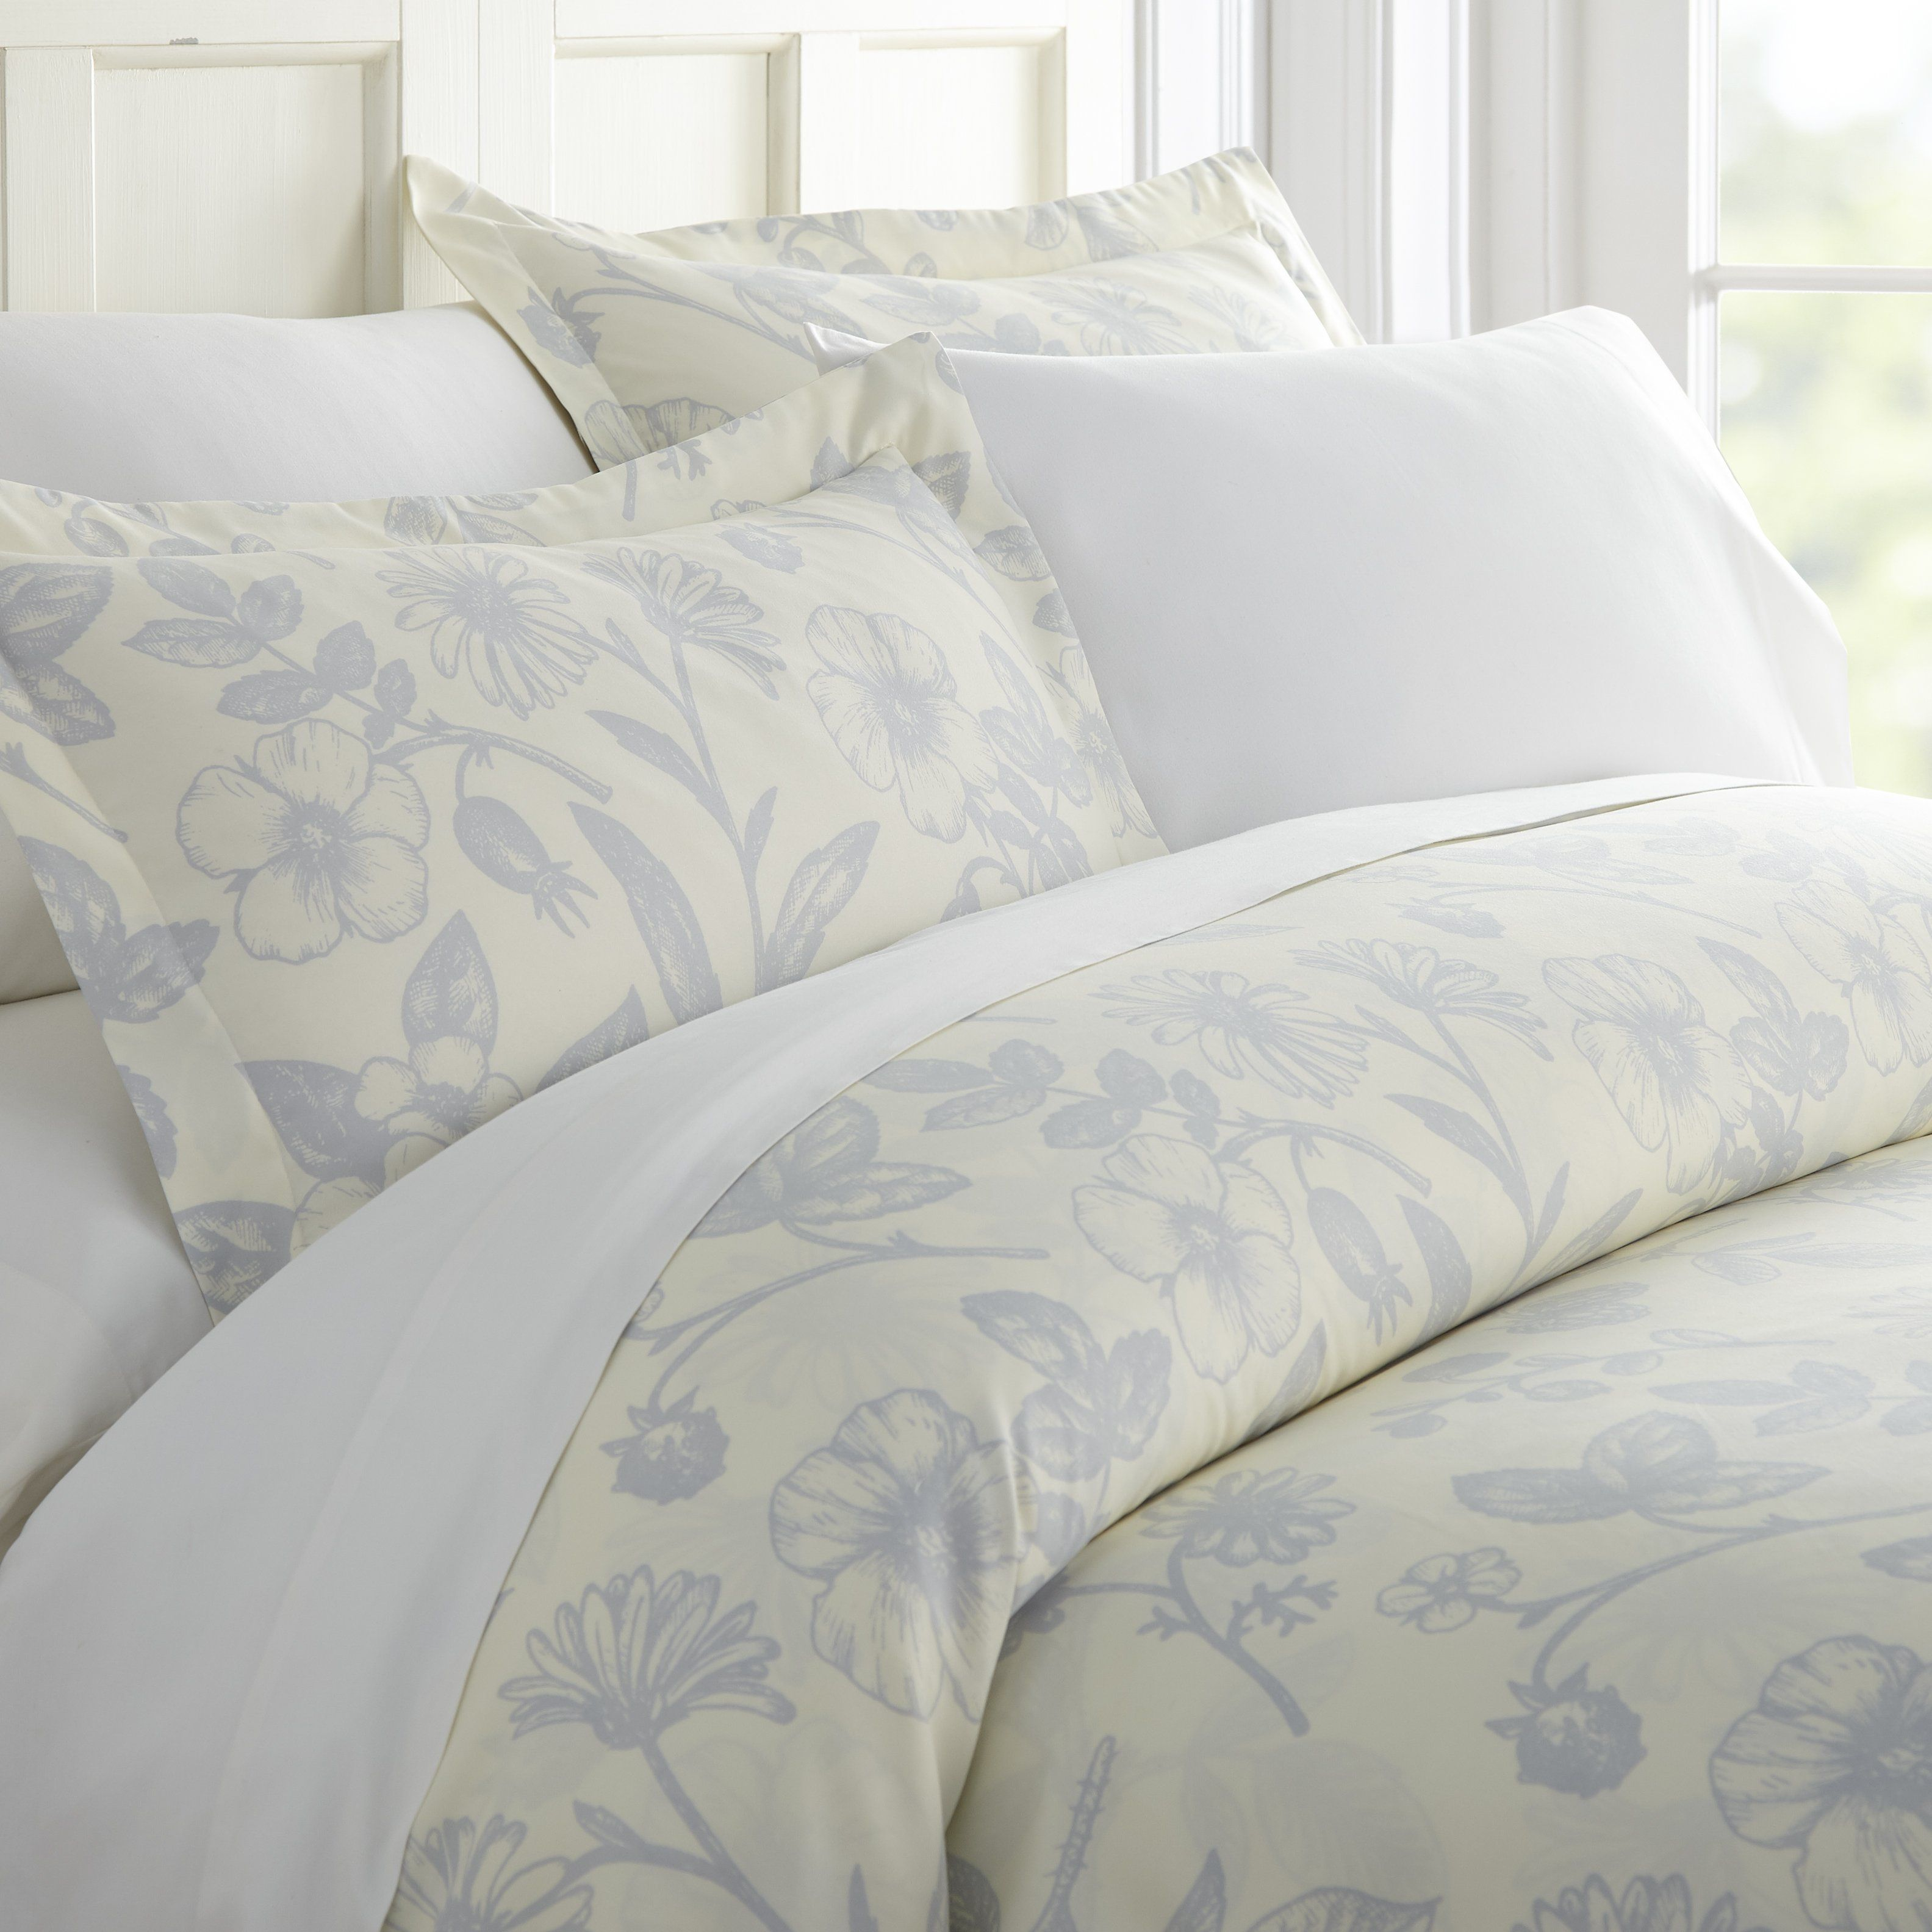 Home Collection Premium Ultra Soft Garden Pattern 3 Piece Duvet Cover Set